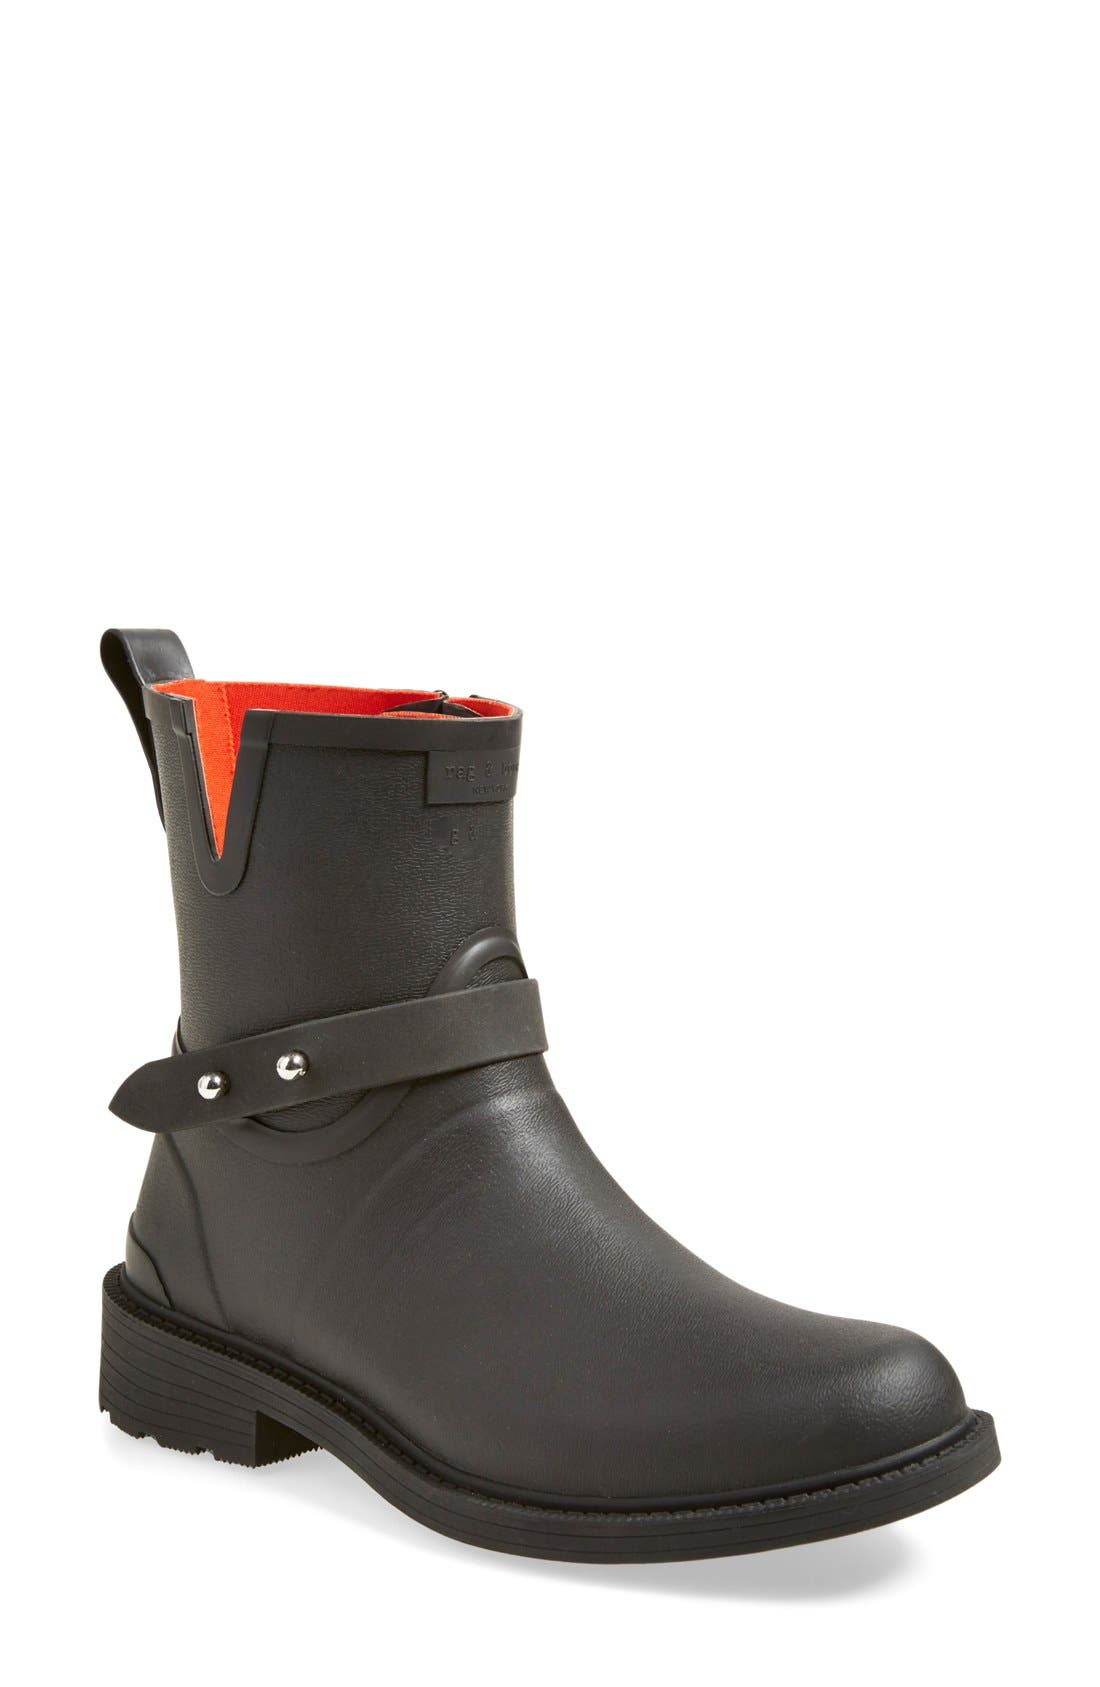 Alternate Image 1 Selected - rag & bone Moto Rain Boot (Women)